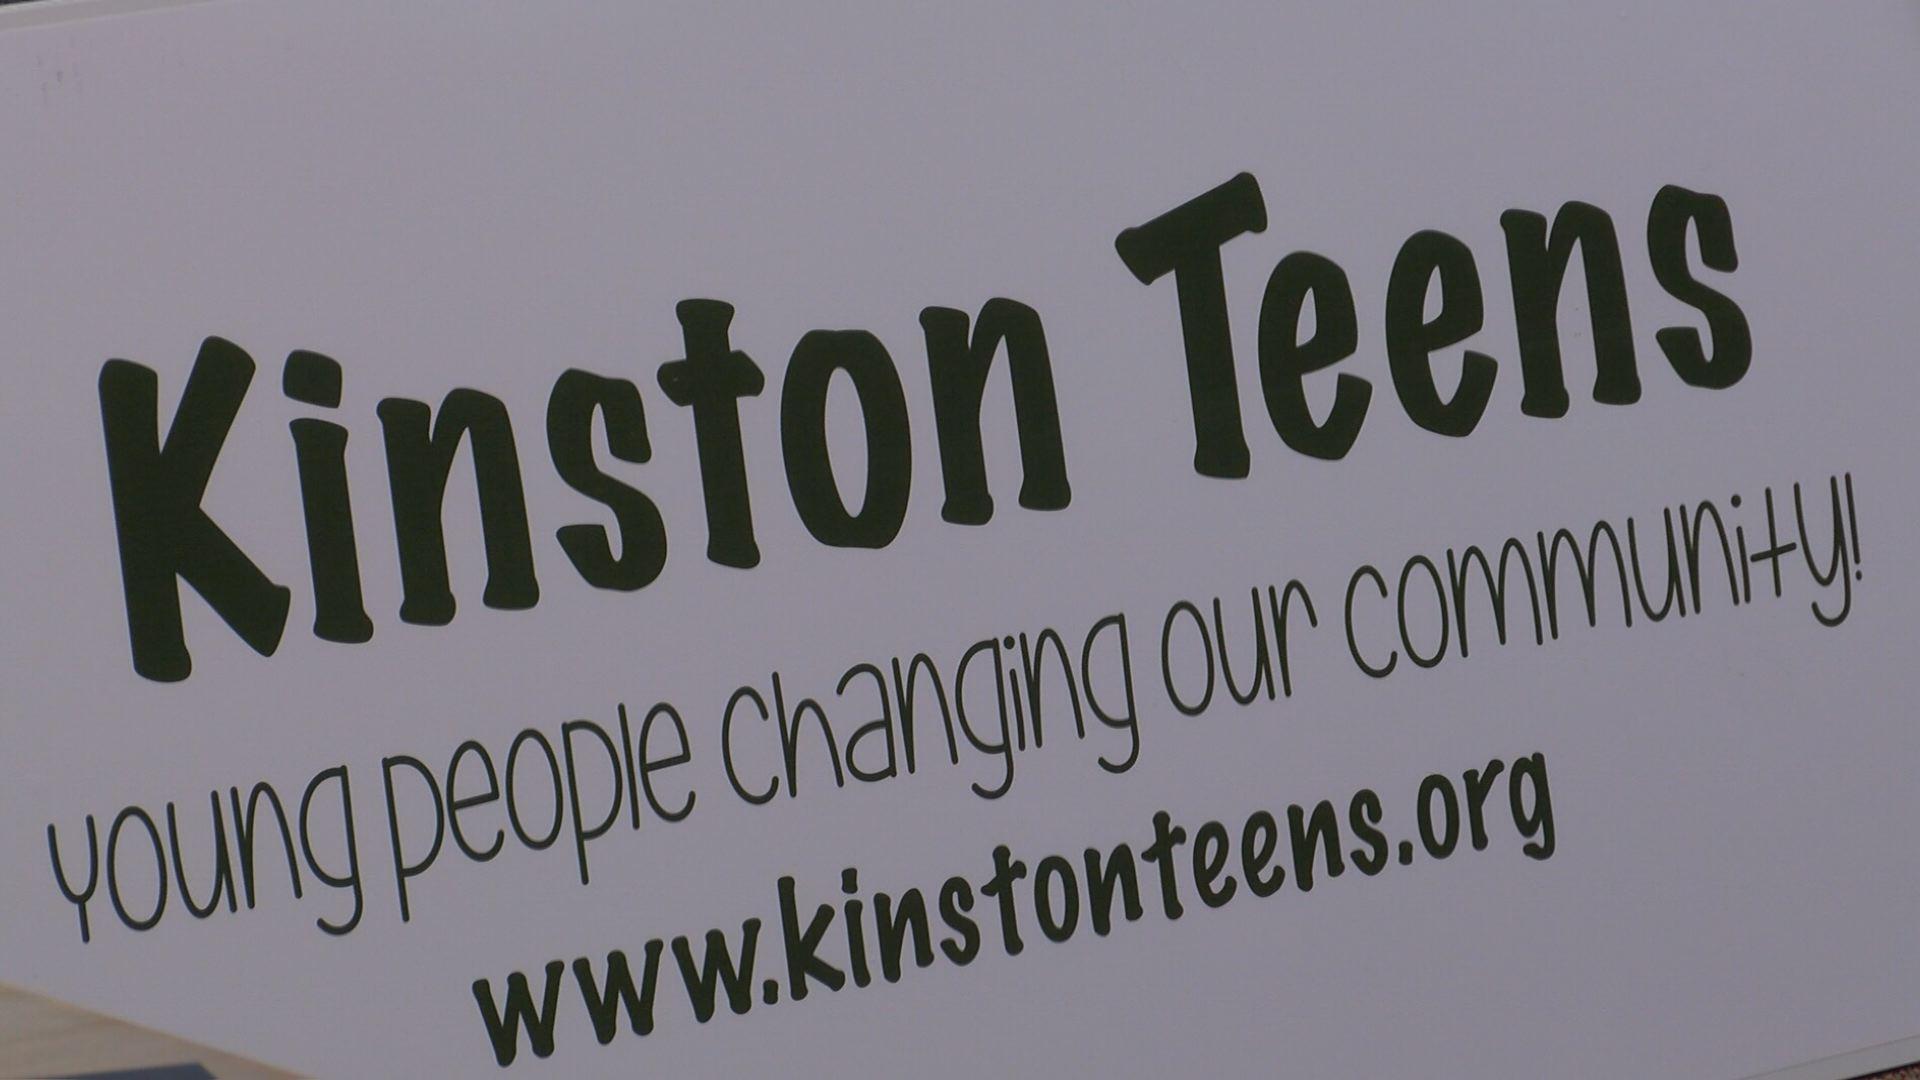 kinston teens_1530269886616.jpg.jpg